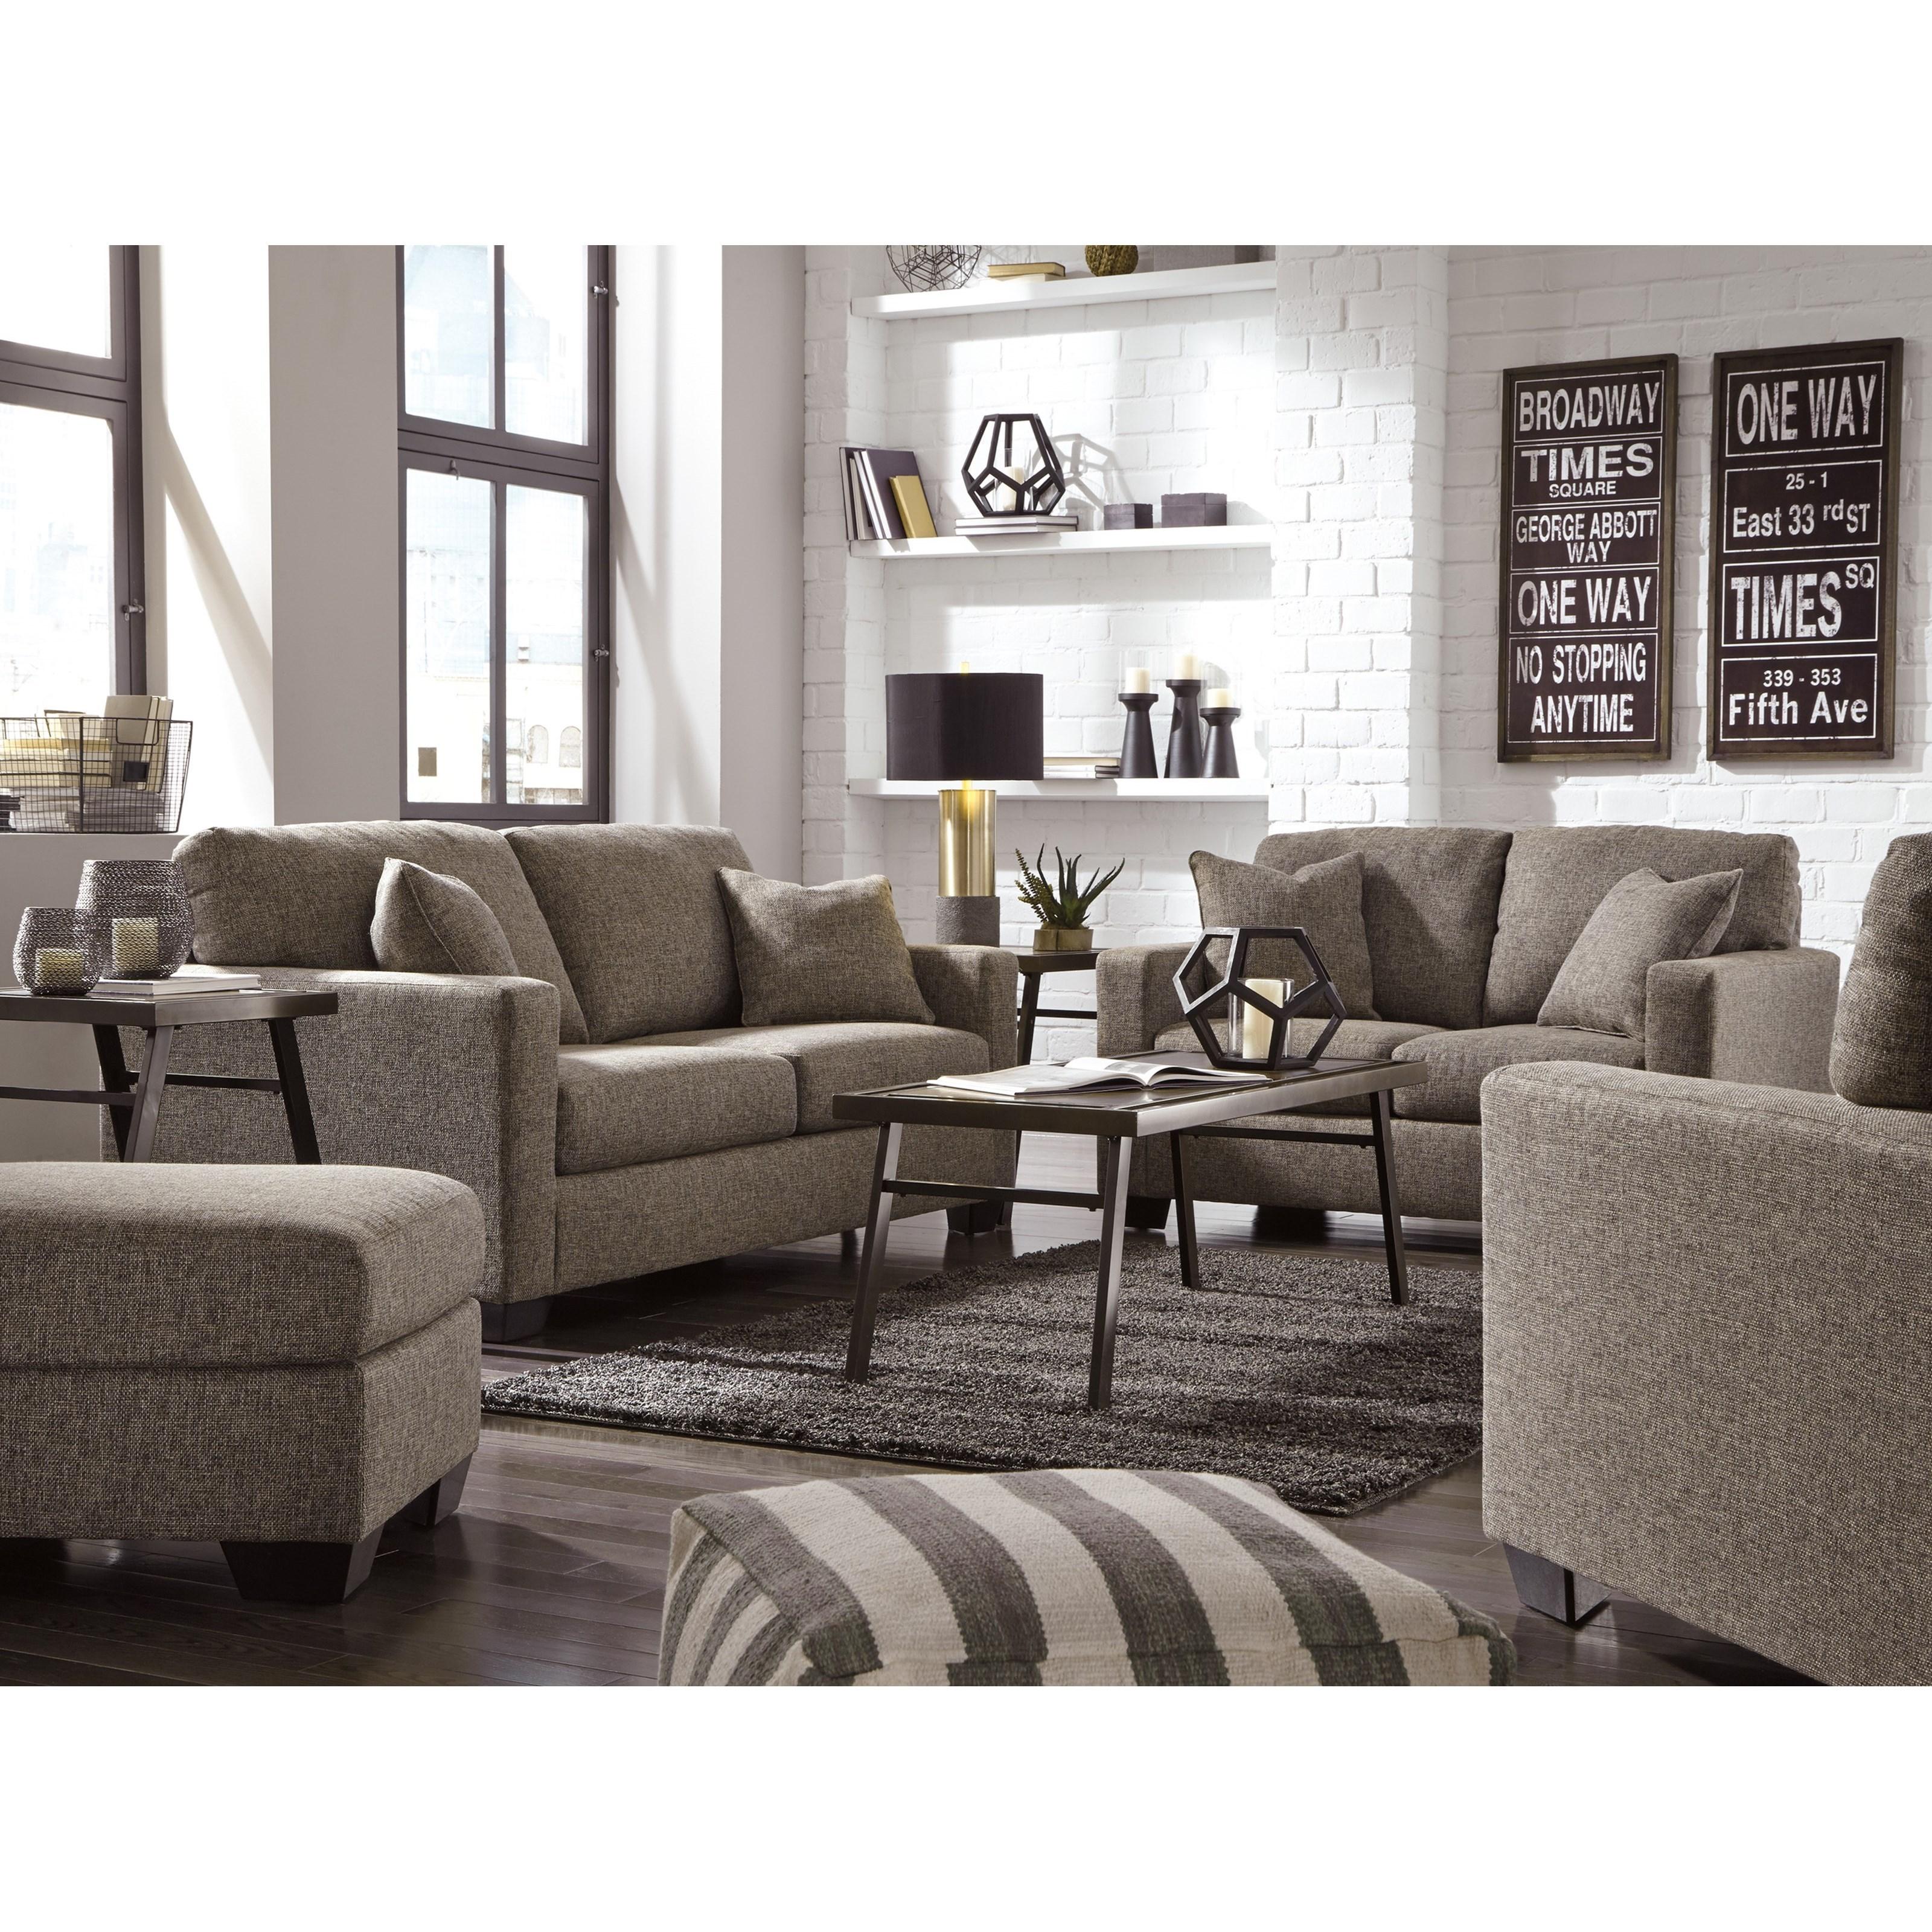 Ashley Furniture Hearne Contemporary Chair Ottoman Olinde 39 S Furniture Chair Ottoman Sets